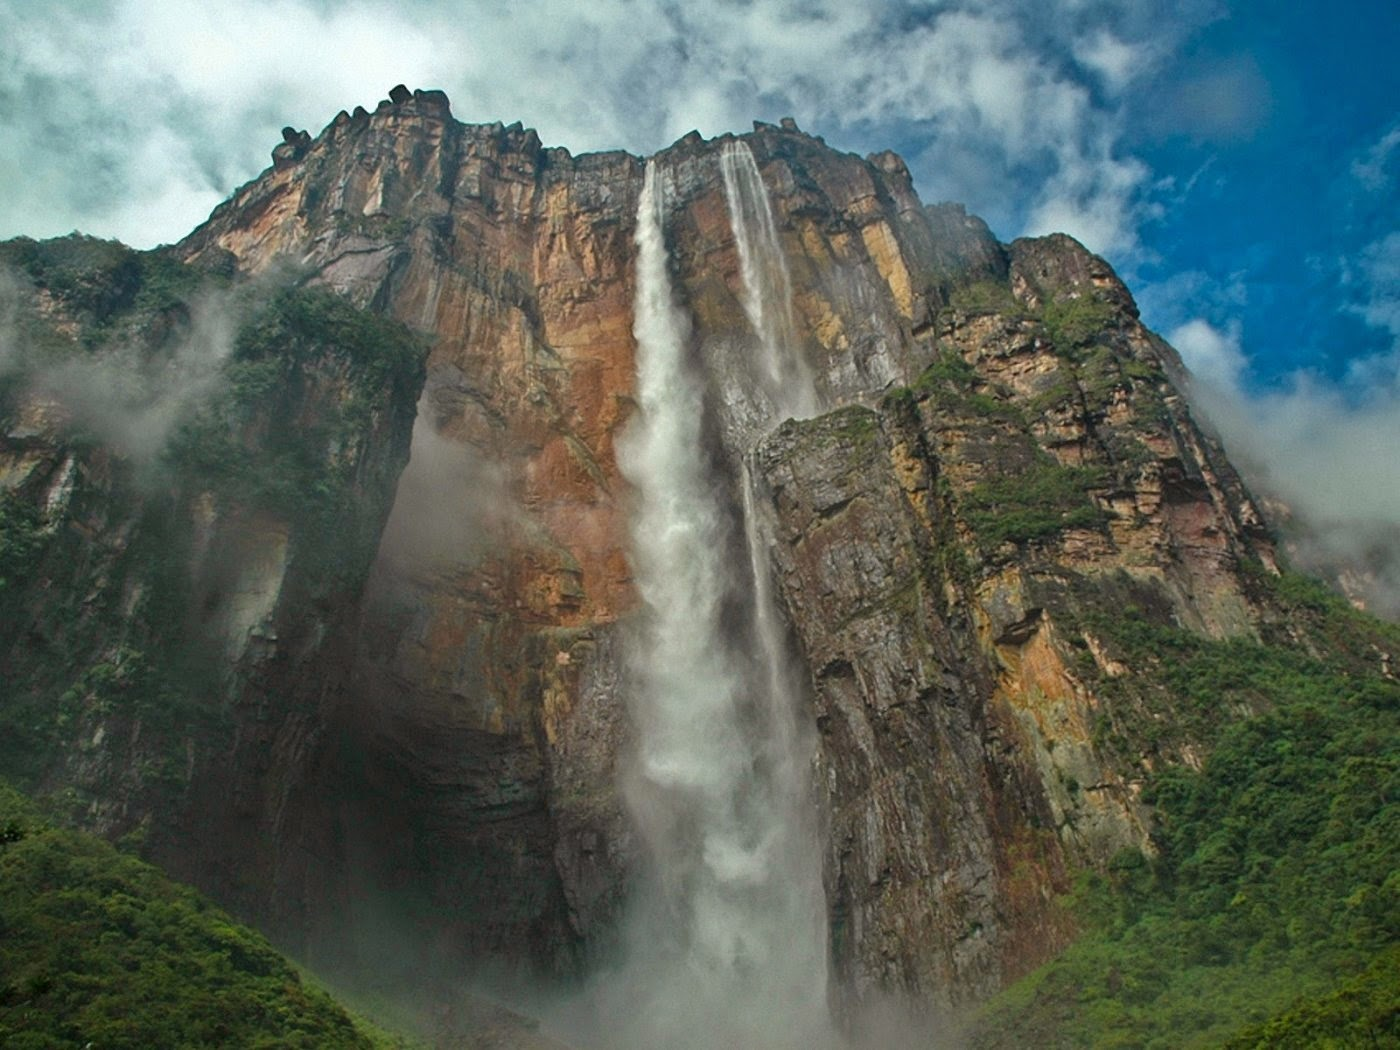 Most Amazing HD Wallpapers - WallpaperSafari - photo#15